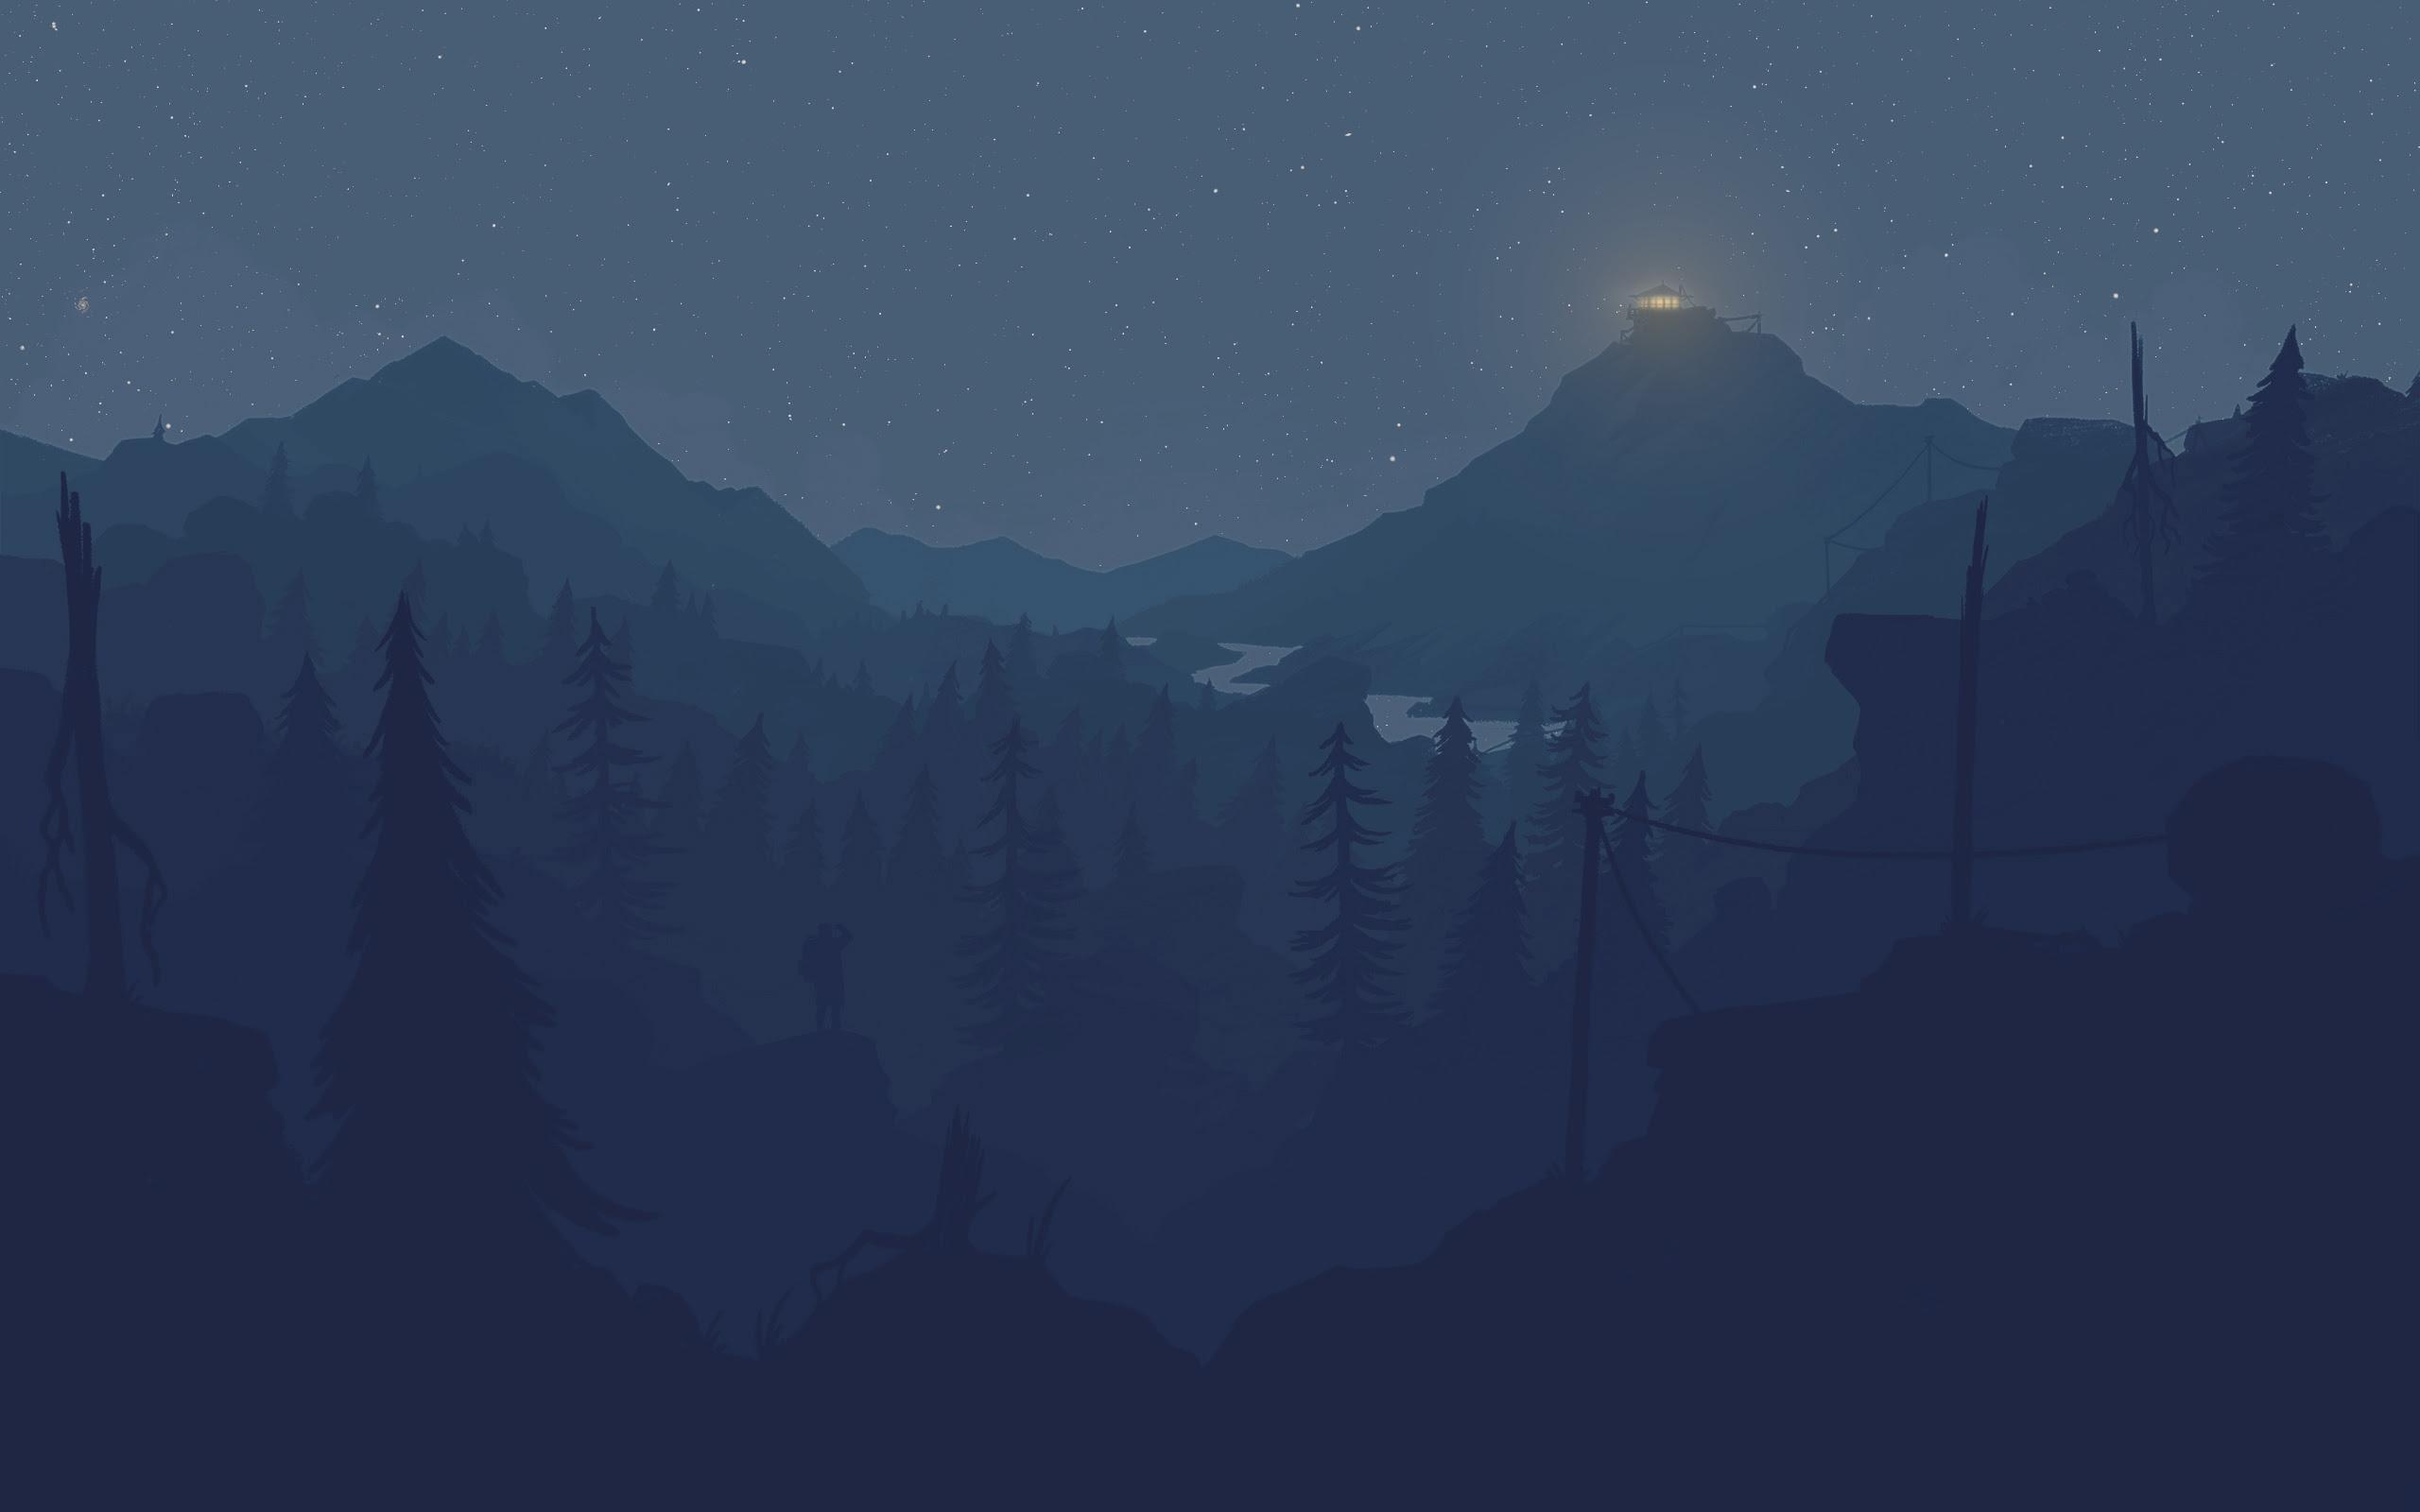 Mountain Wallpaper Reddit